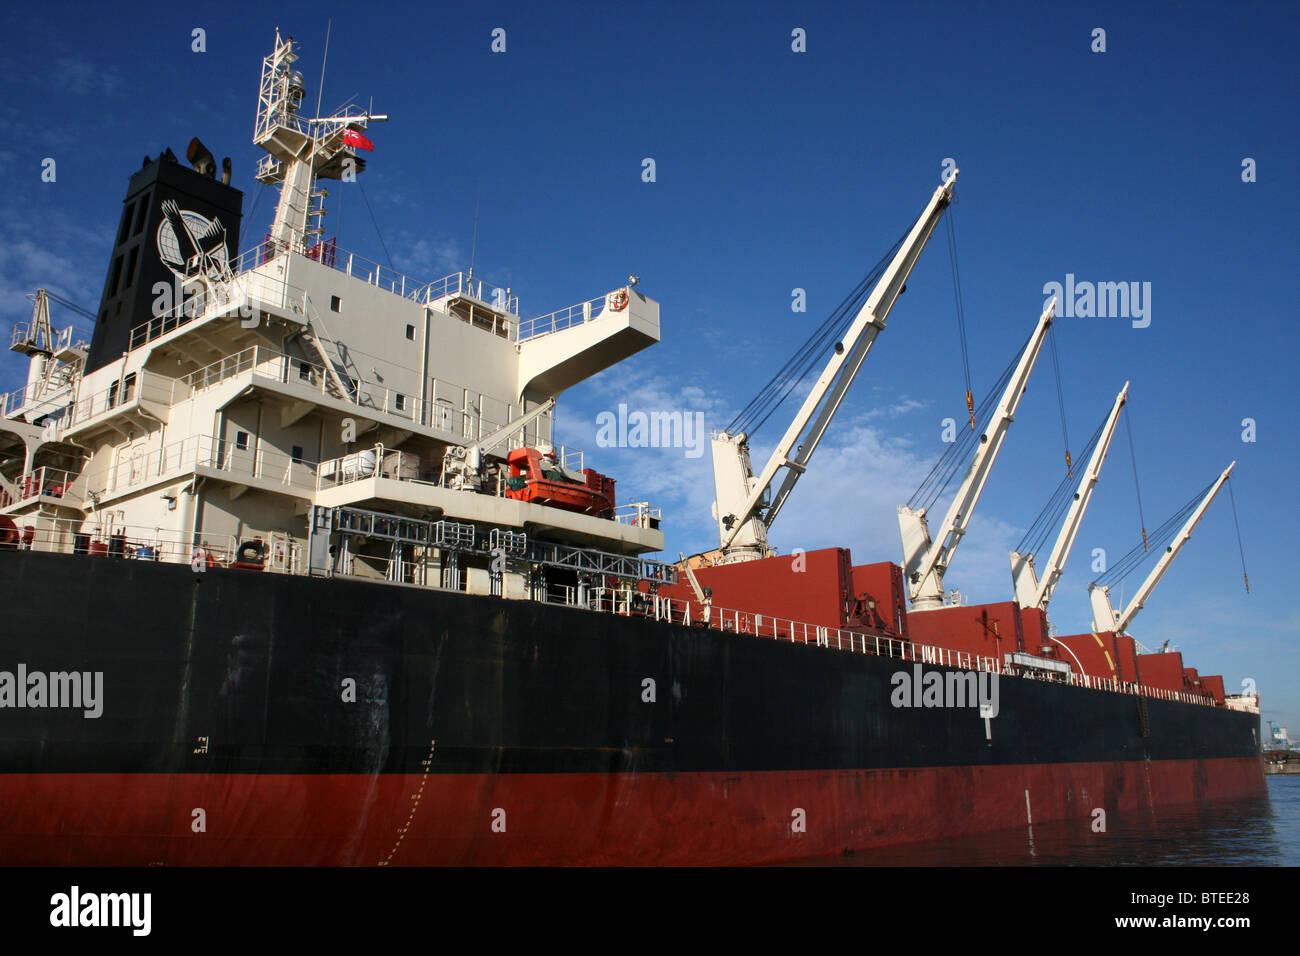 Cranes On The Cargo Ship 'Stellar Eagle', Liverpool Docks, UK - Stock Image